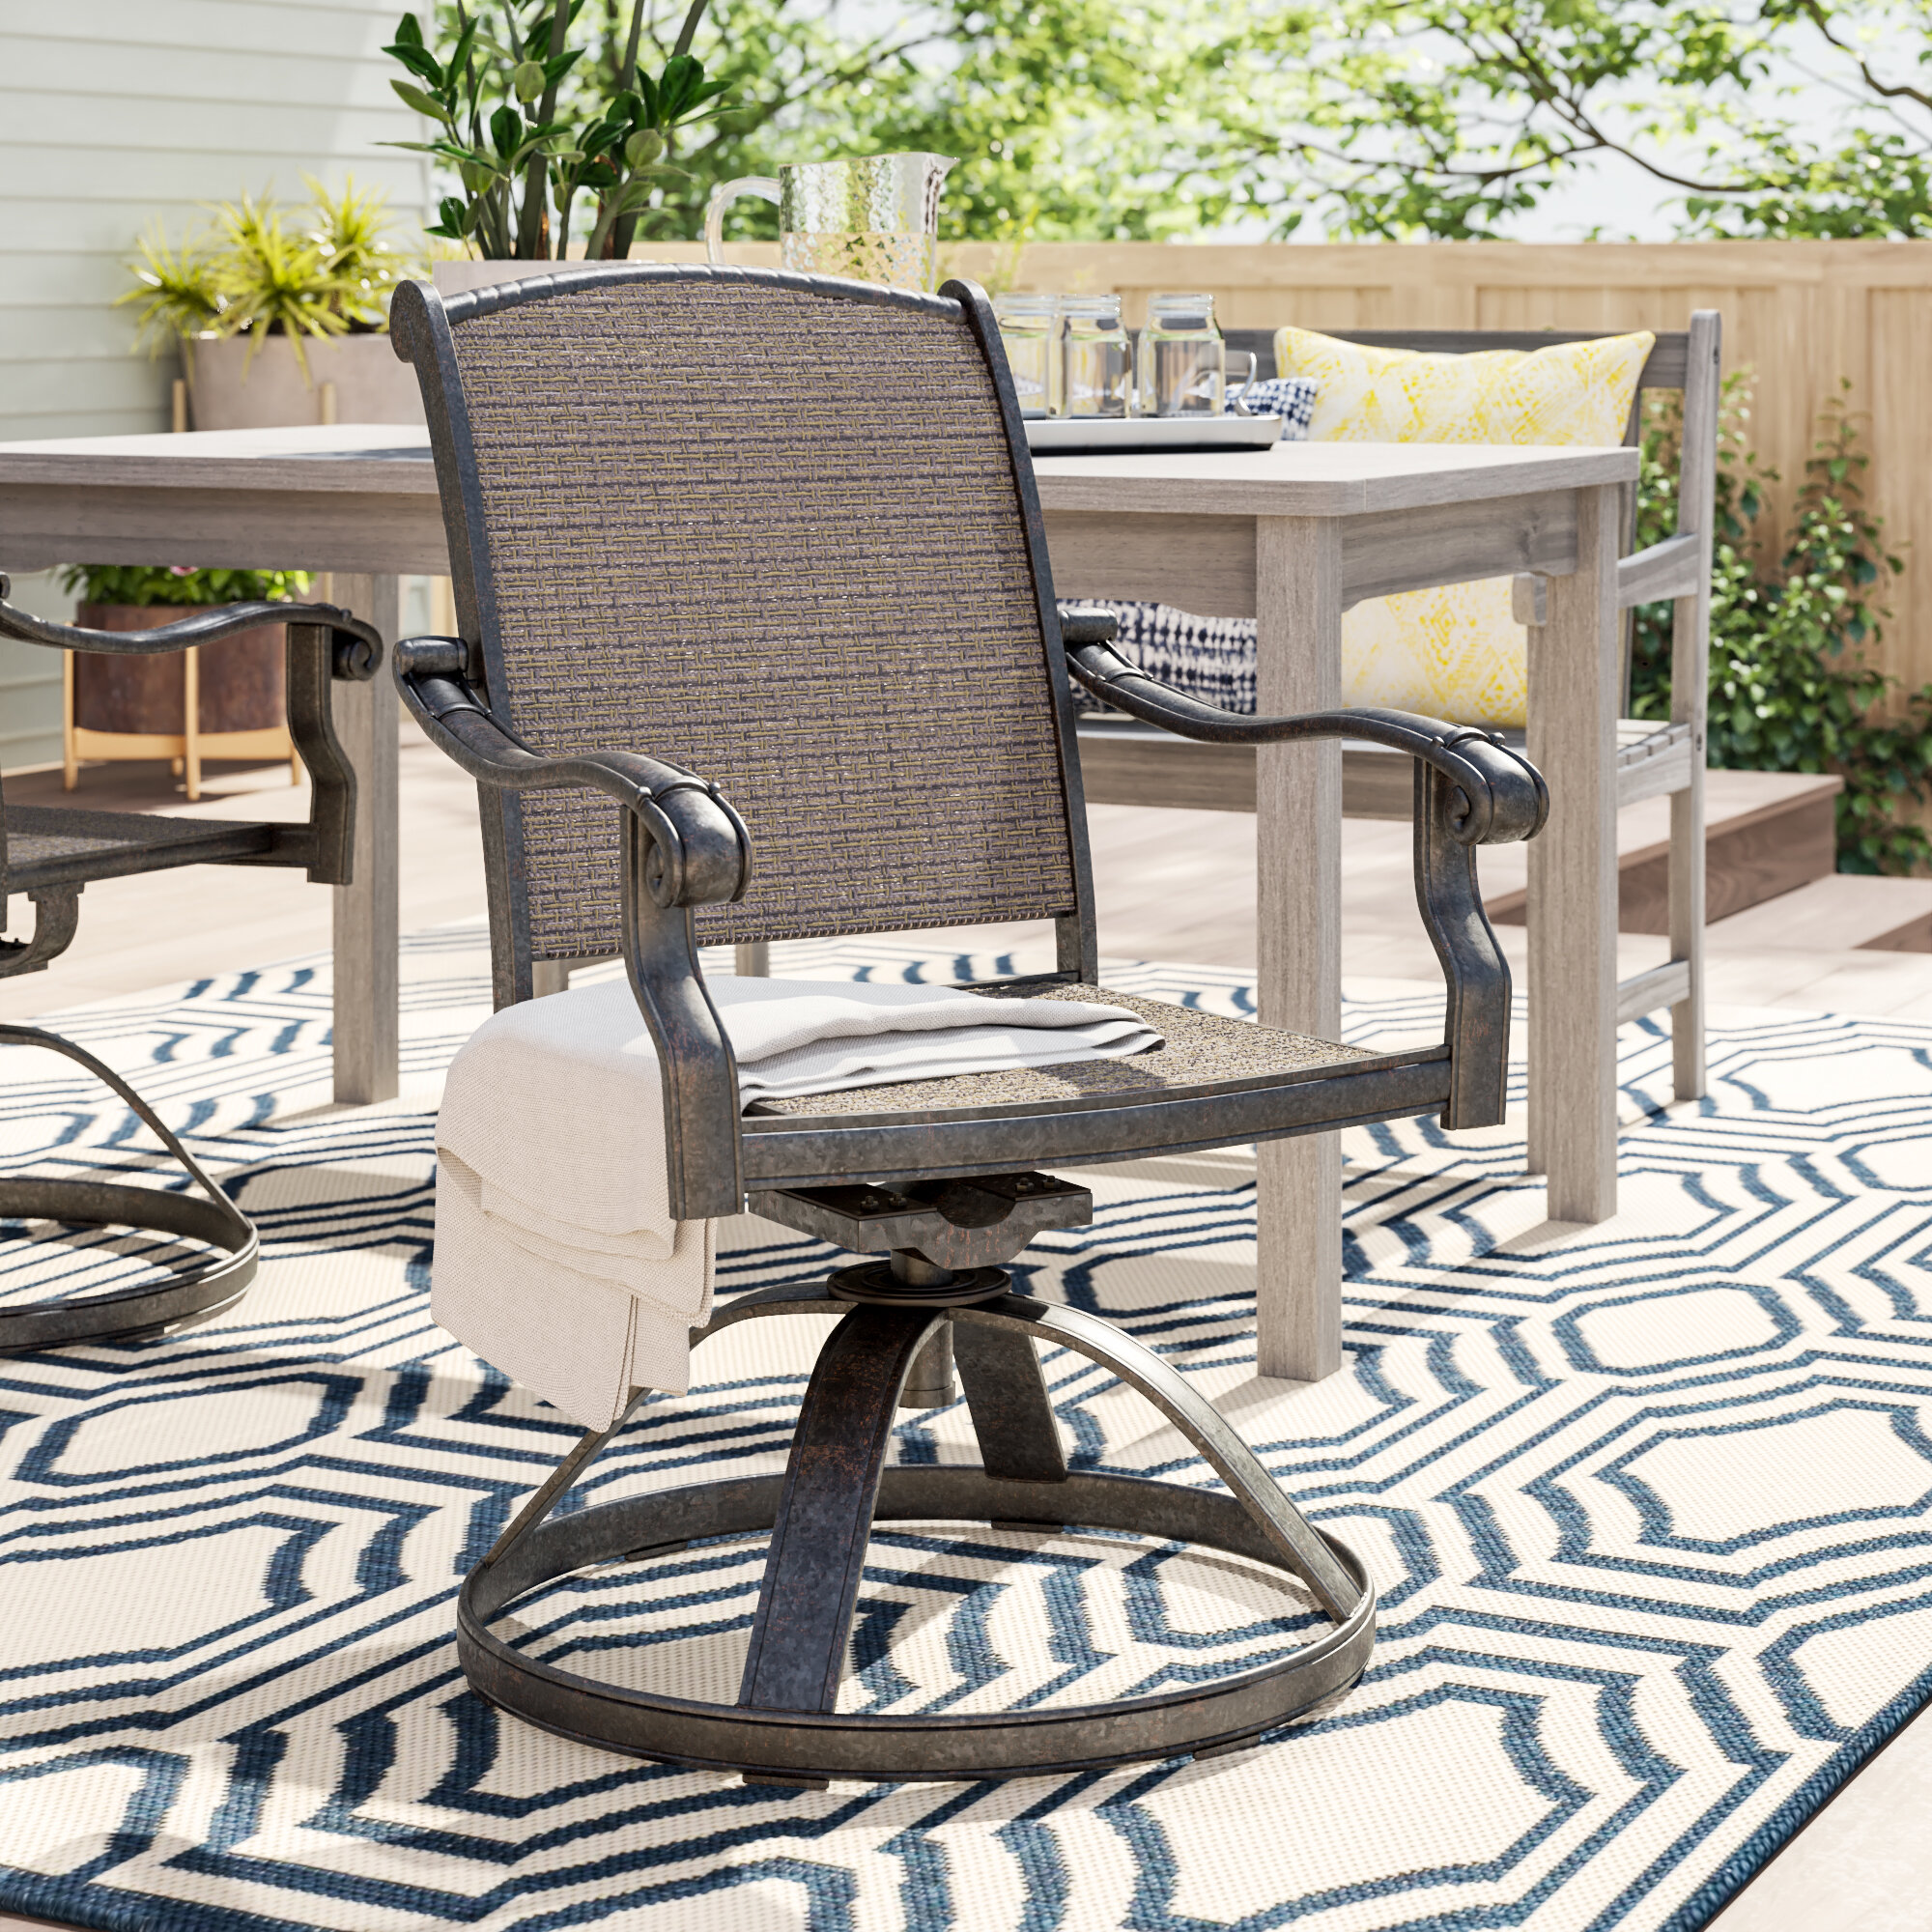 Awe Inspiring Sol 72 Outdoor Harland Swivel Patio Dining Chair Wayfair Inzonedesignstudio Interior Chair Design Inzonedesignstudiocom